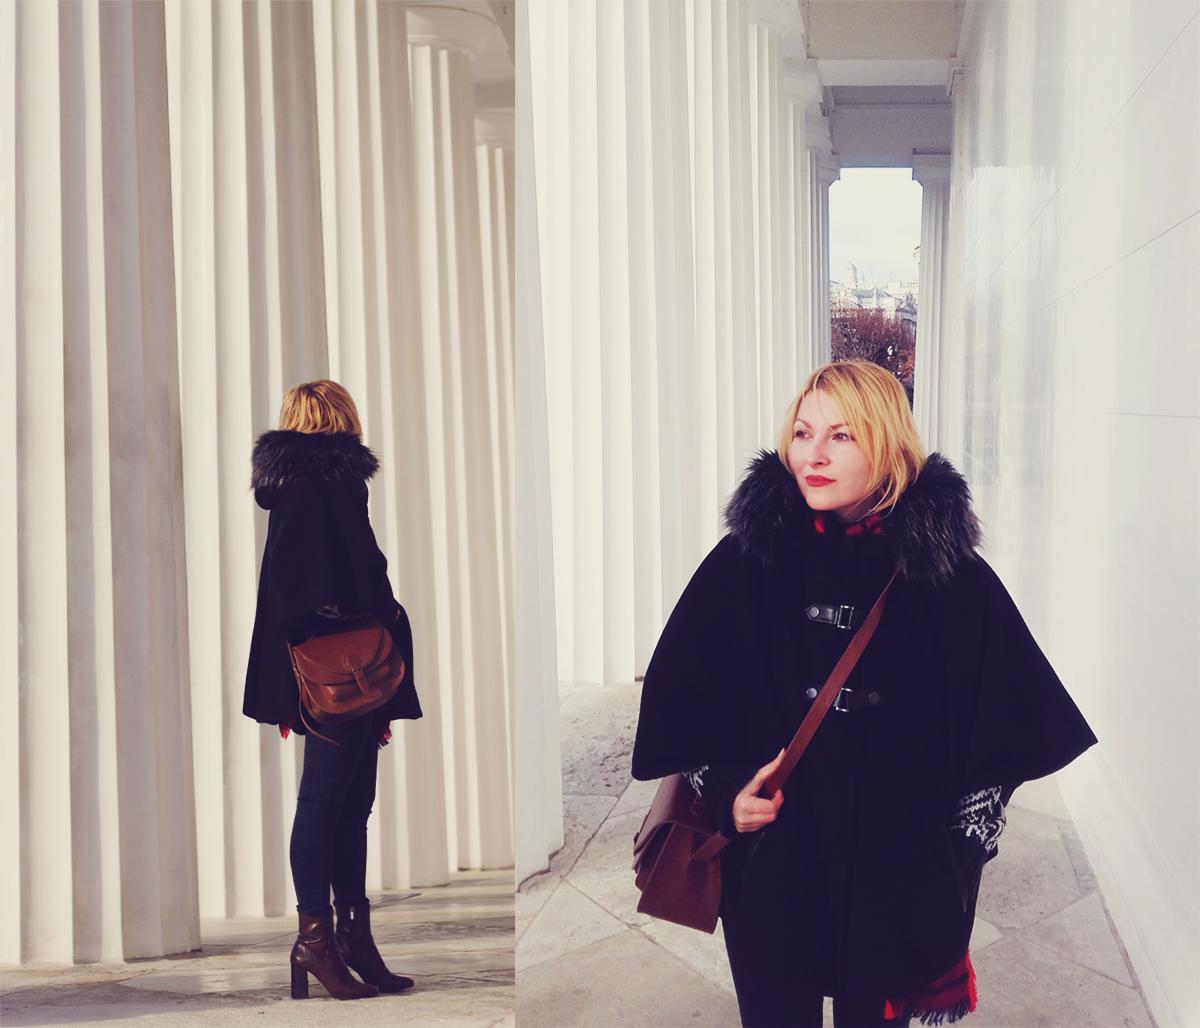 Vienna, winter, Theseus Temple, colonnades, winter coat, boots, jeans, winter fashion, travel